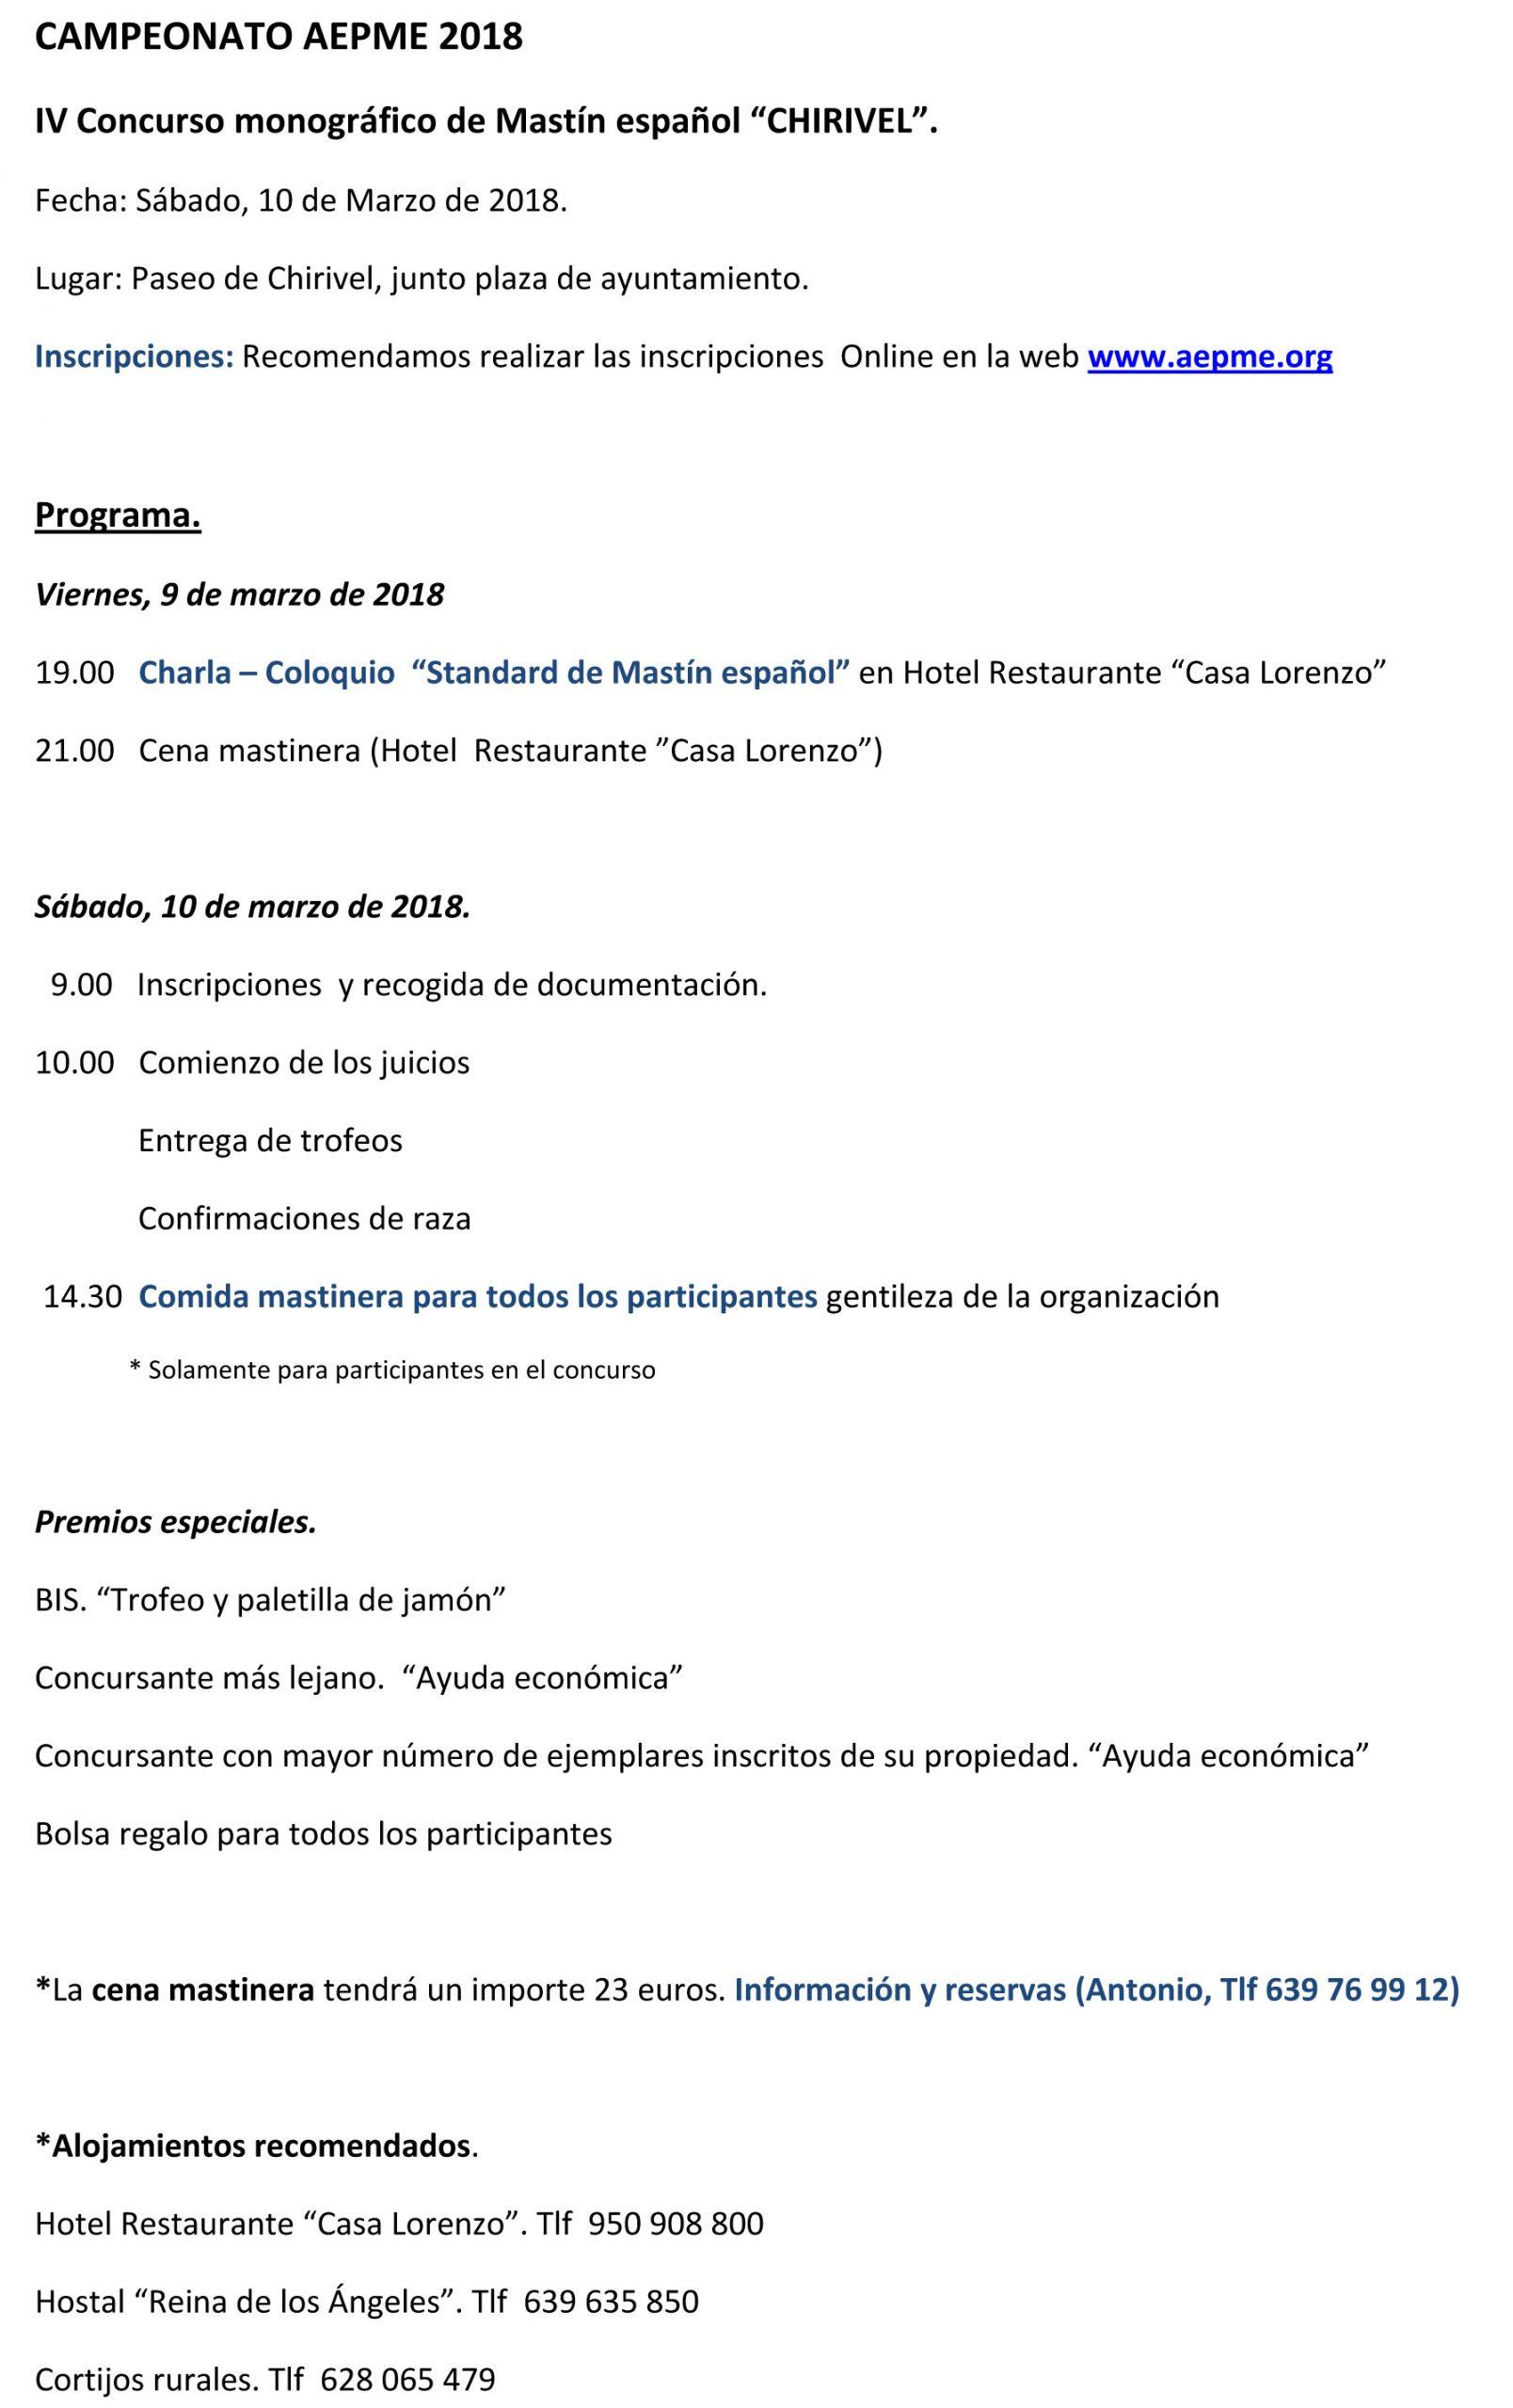 Programa Concurso Chirivel 2018 nuevo